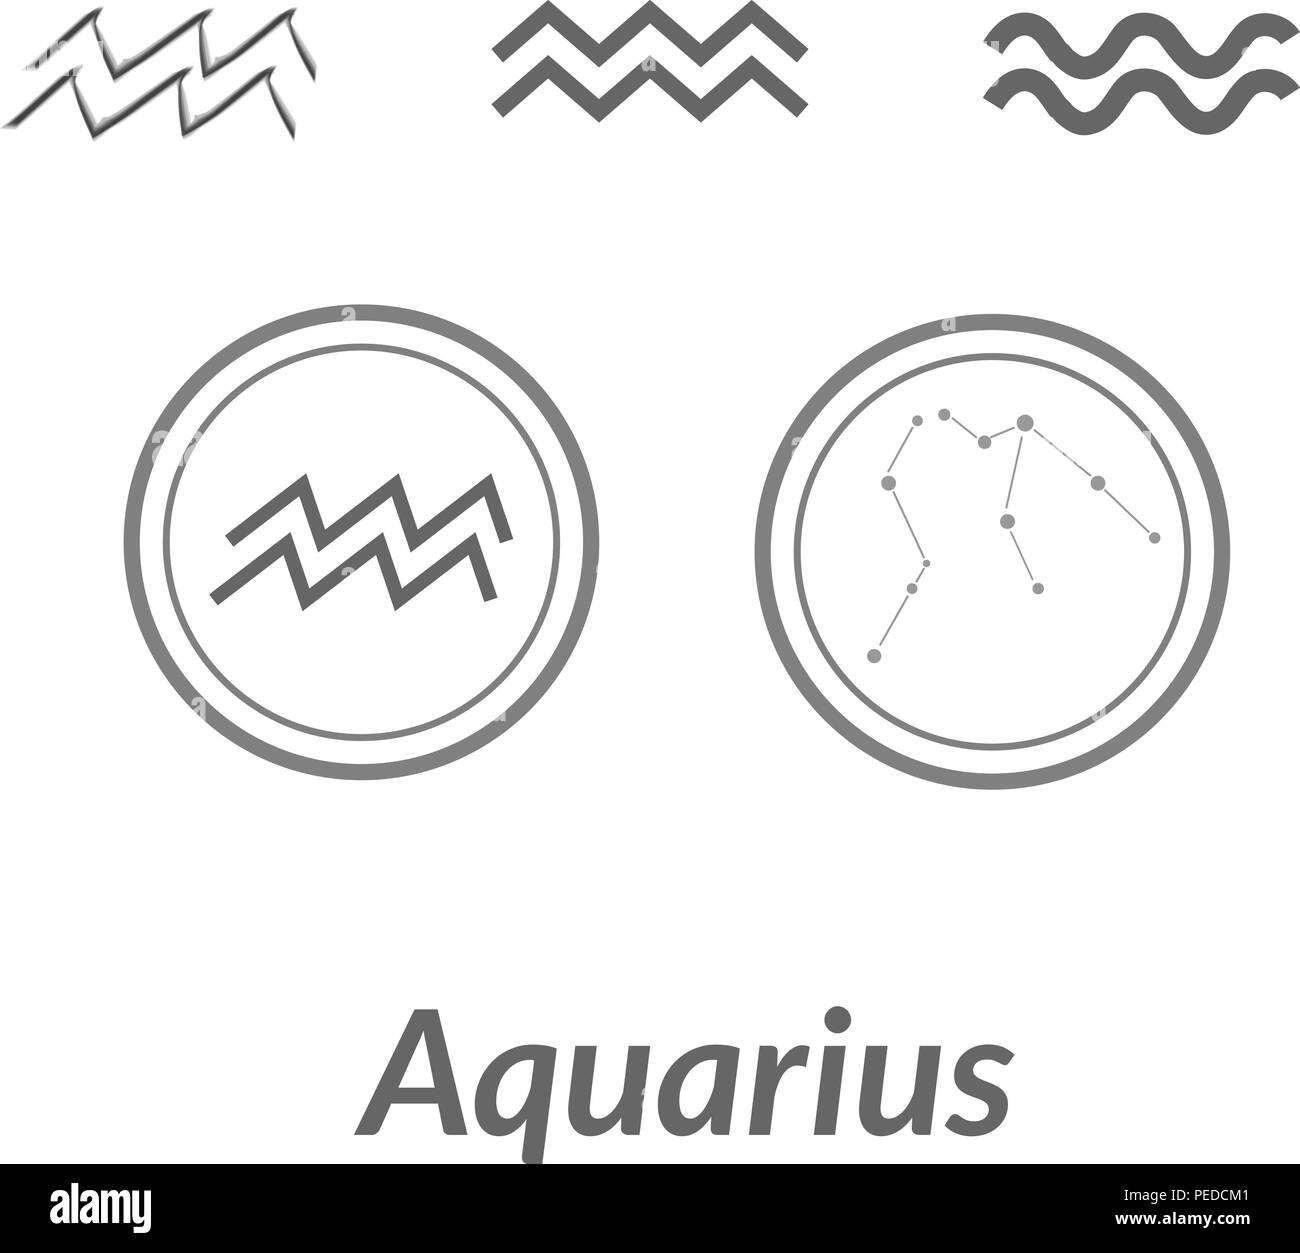 The Water-Bearer aquarius sings set. Star constellation vector element. Age of aquarius constellation zodiac symbol on light white background. - Stock Vector